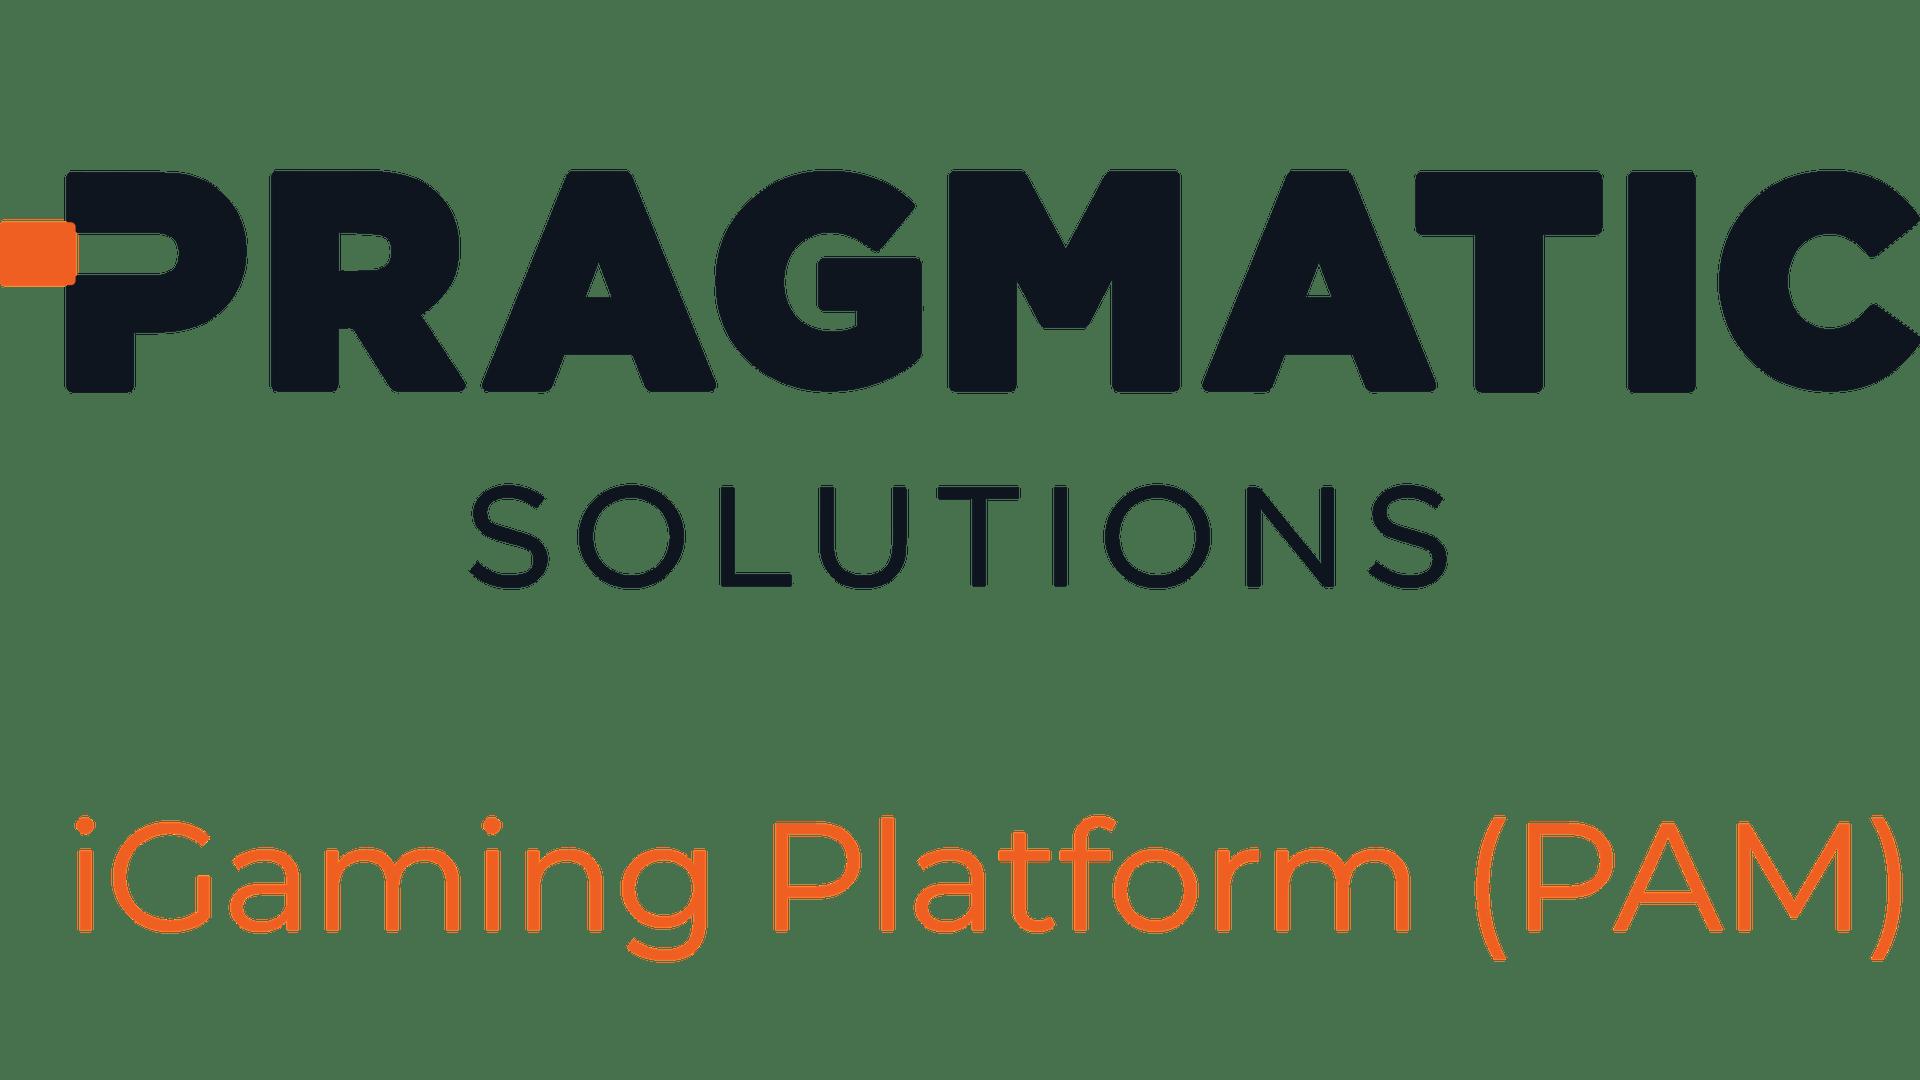 Pragmatic Solutions